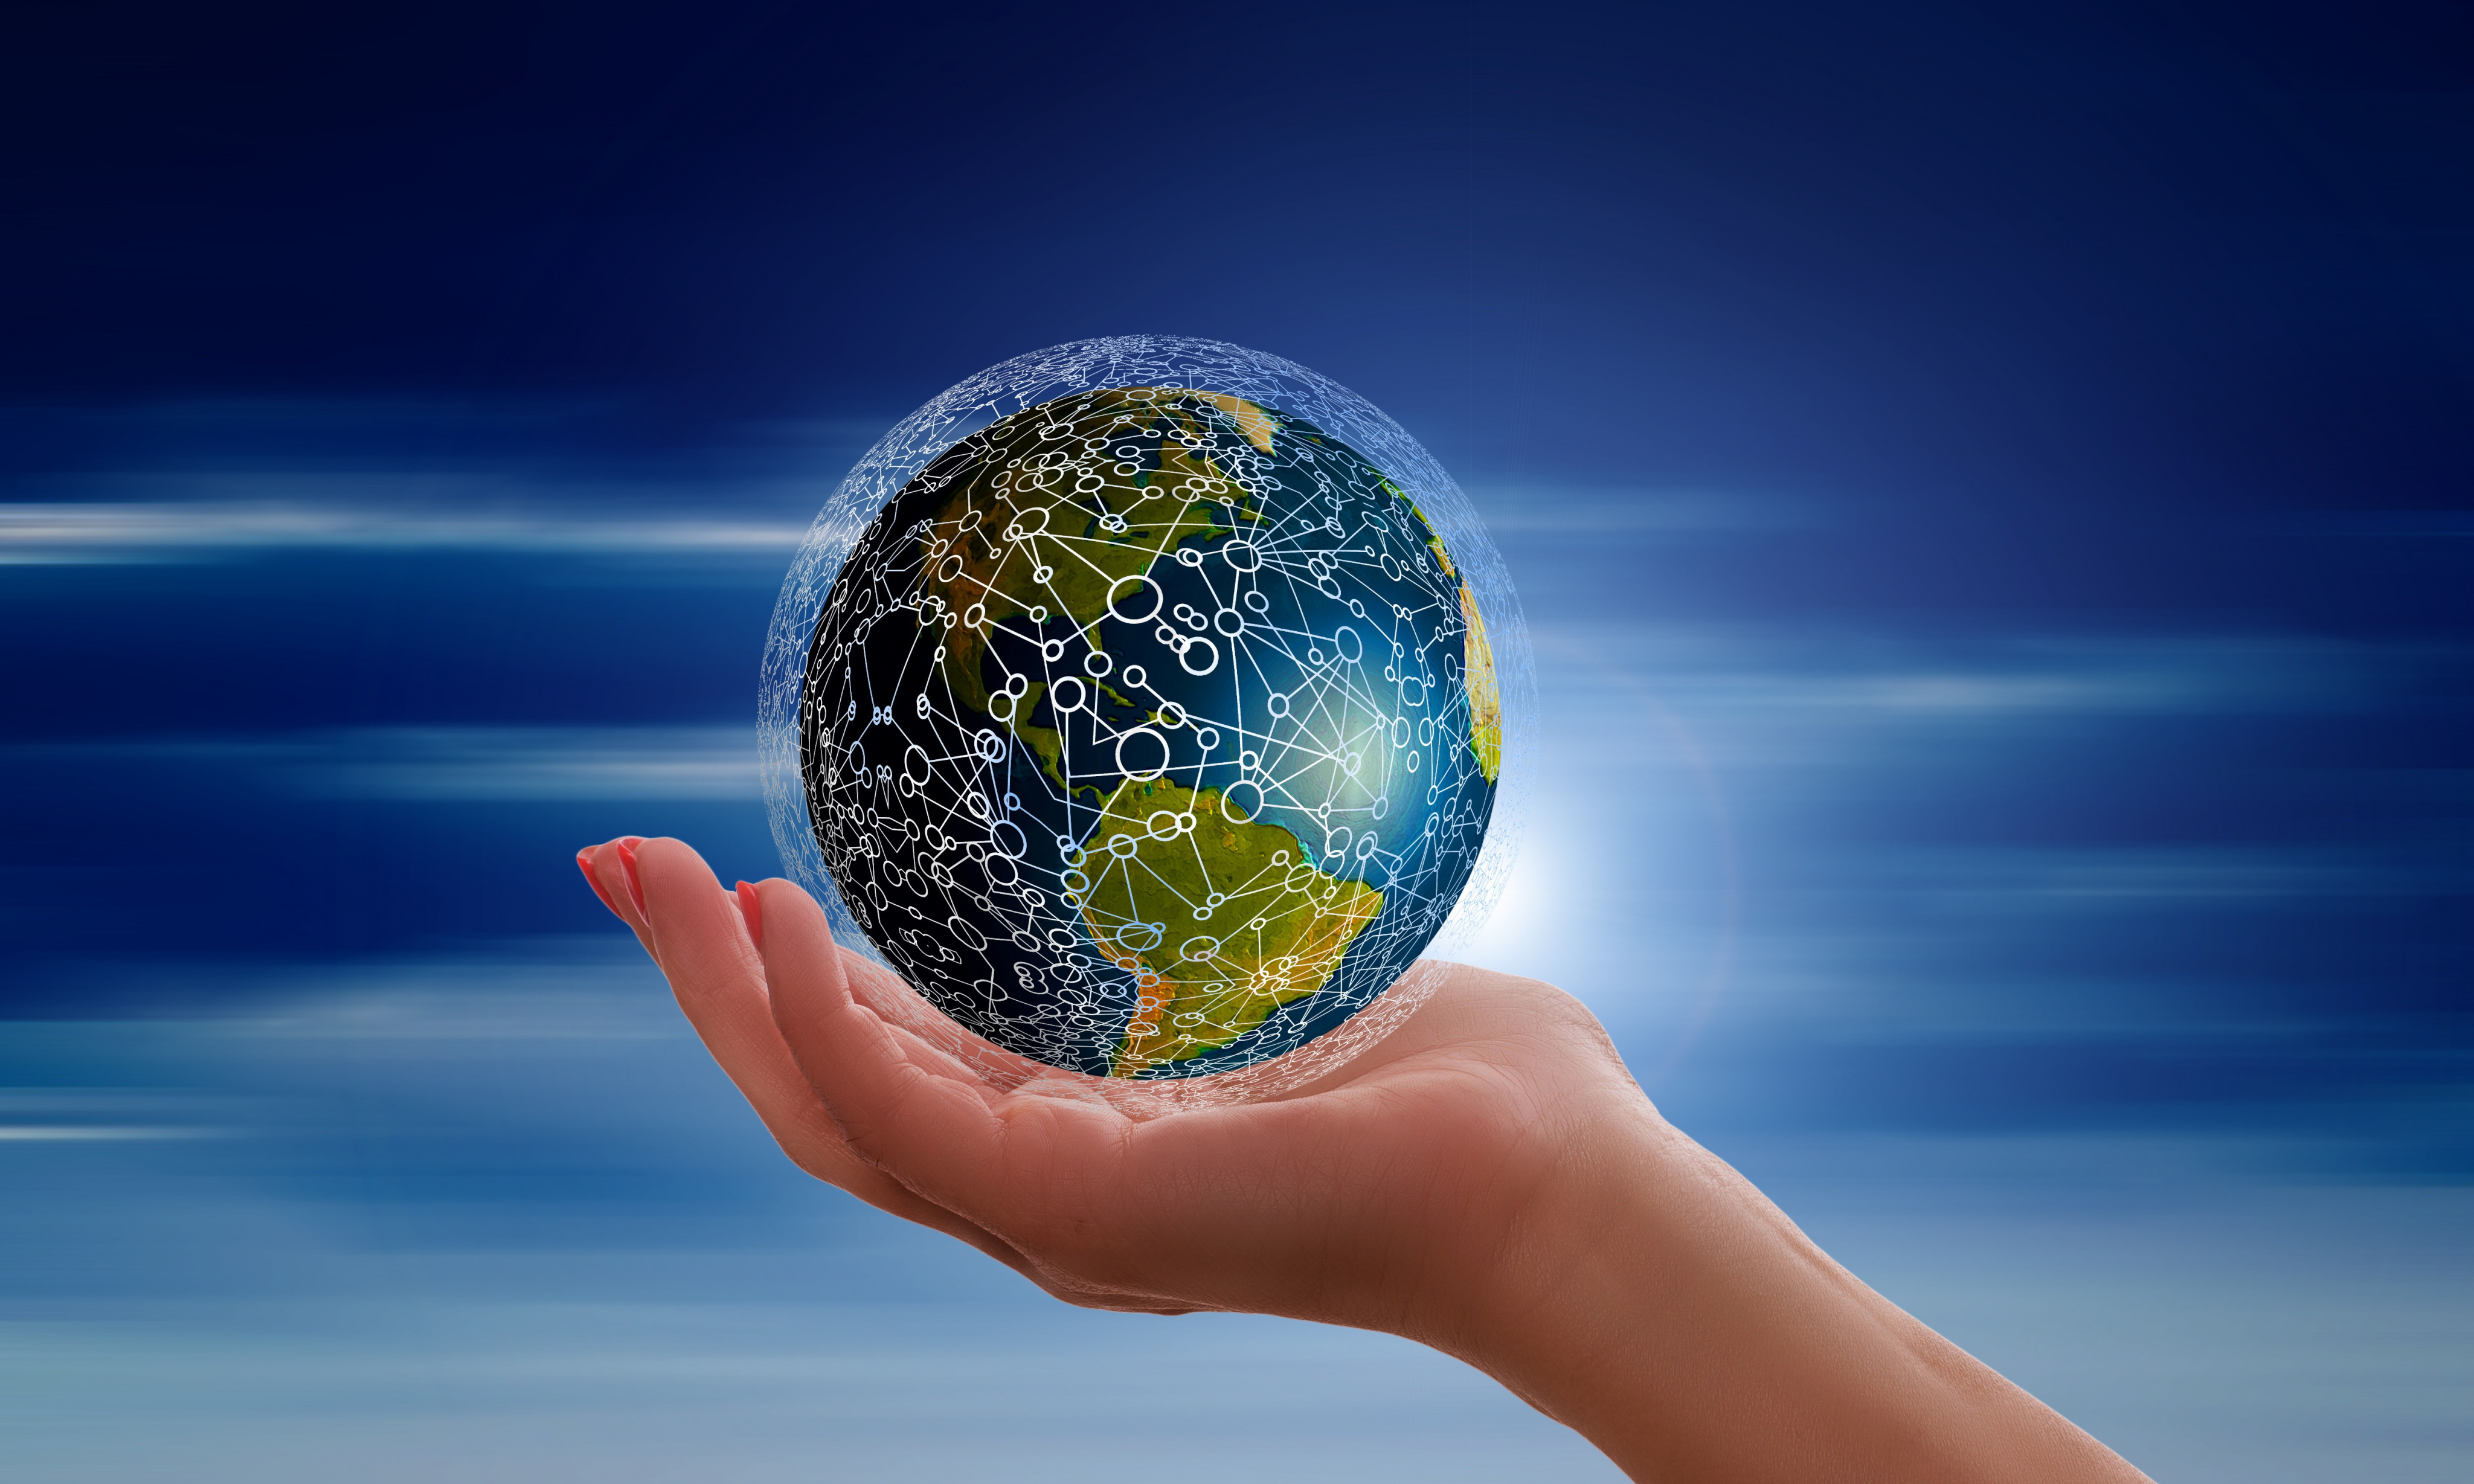 Planet Hand 4096x2457